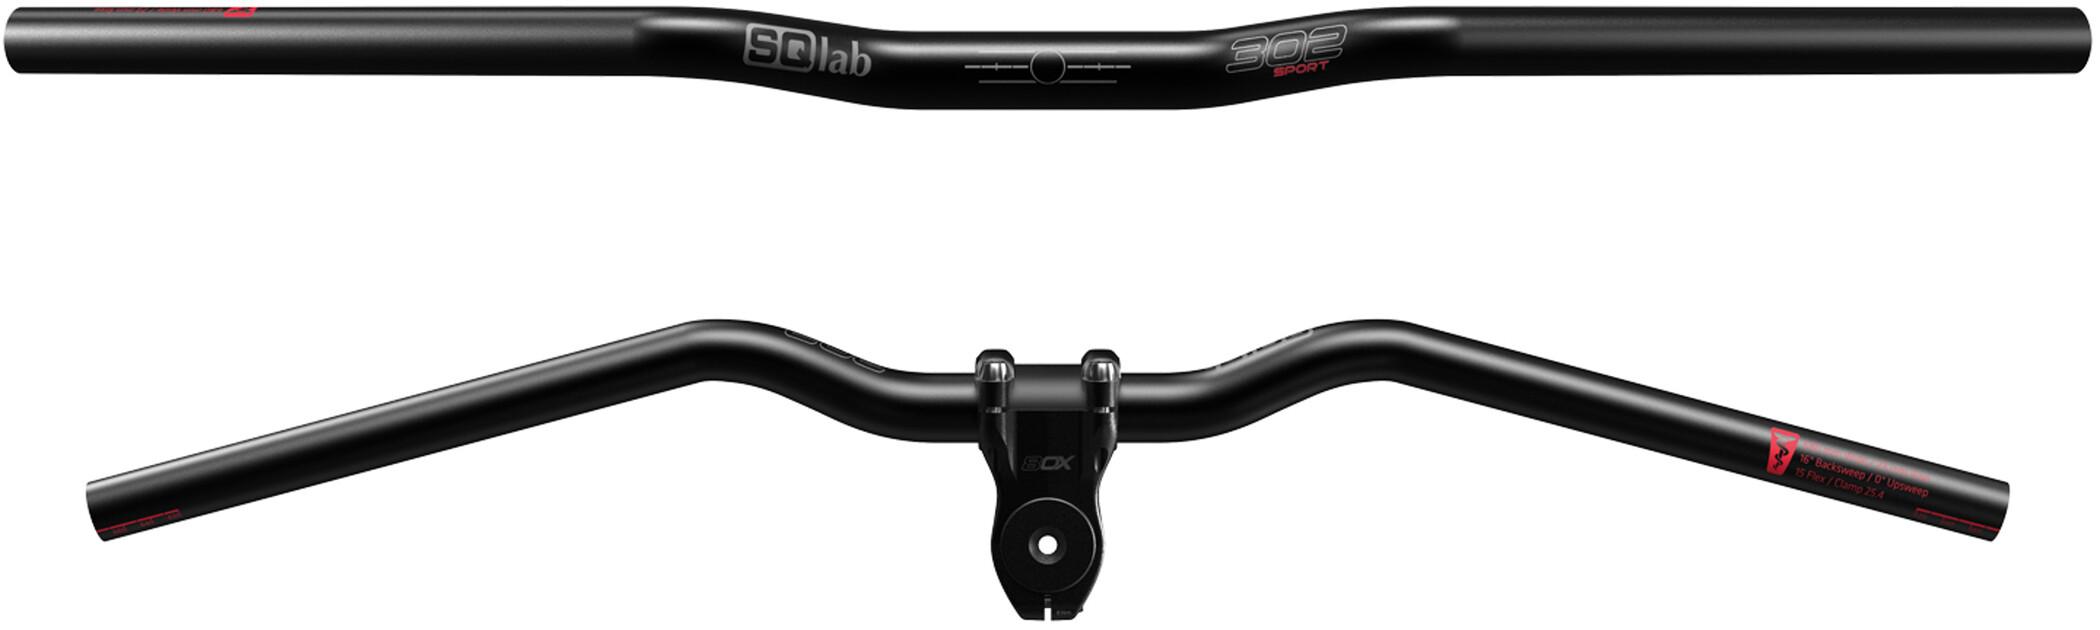 SQlab 302 Sport 2.0 Cykelstyr, black (2019) | Handlebars